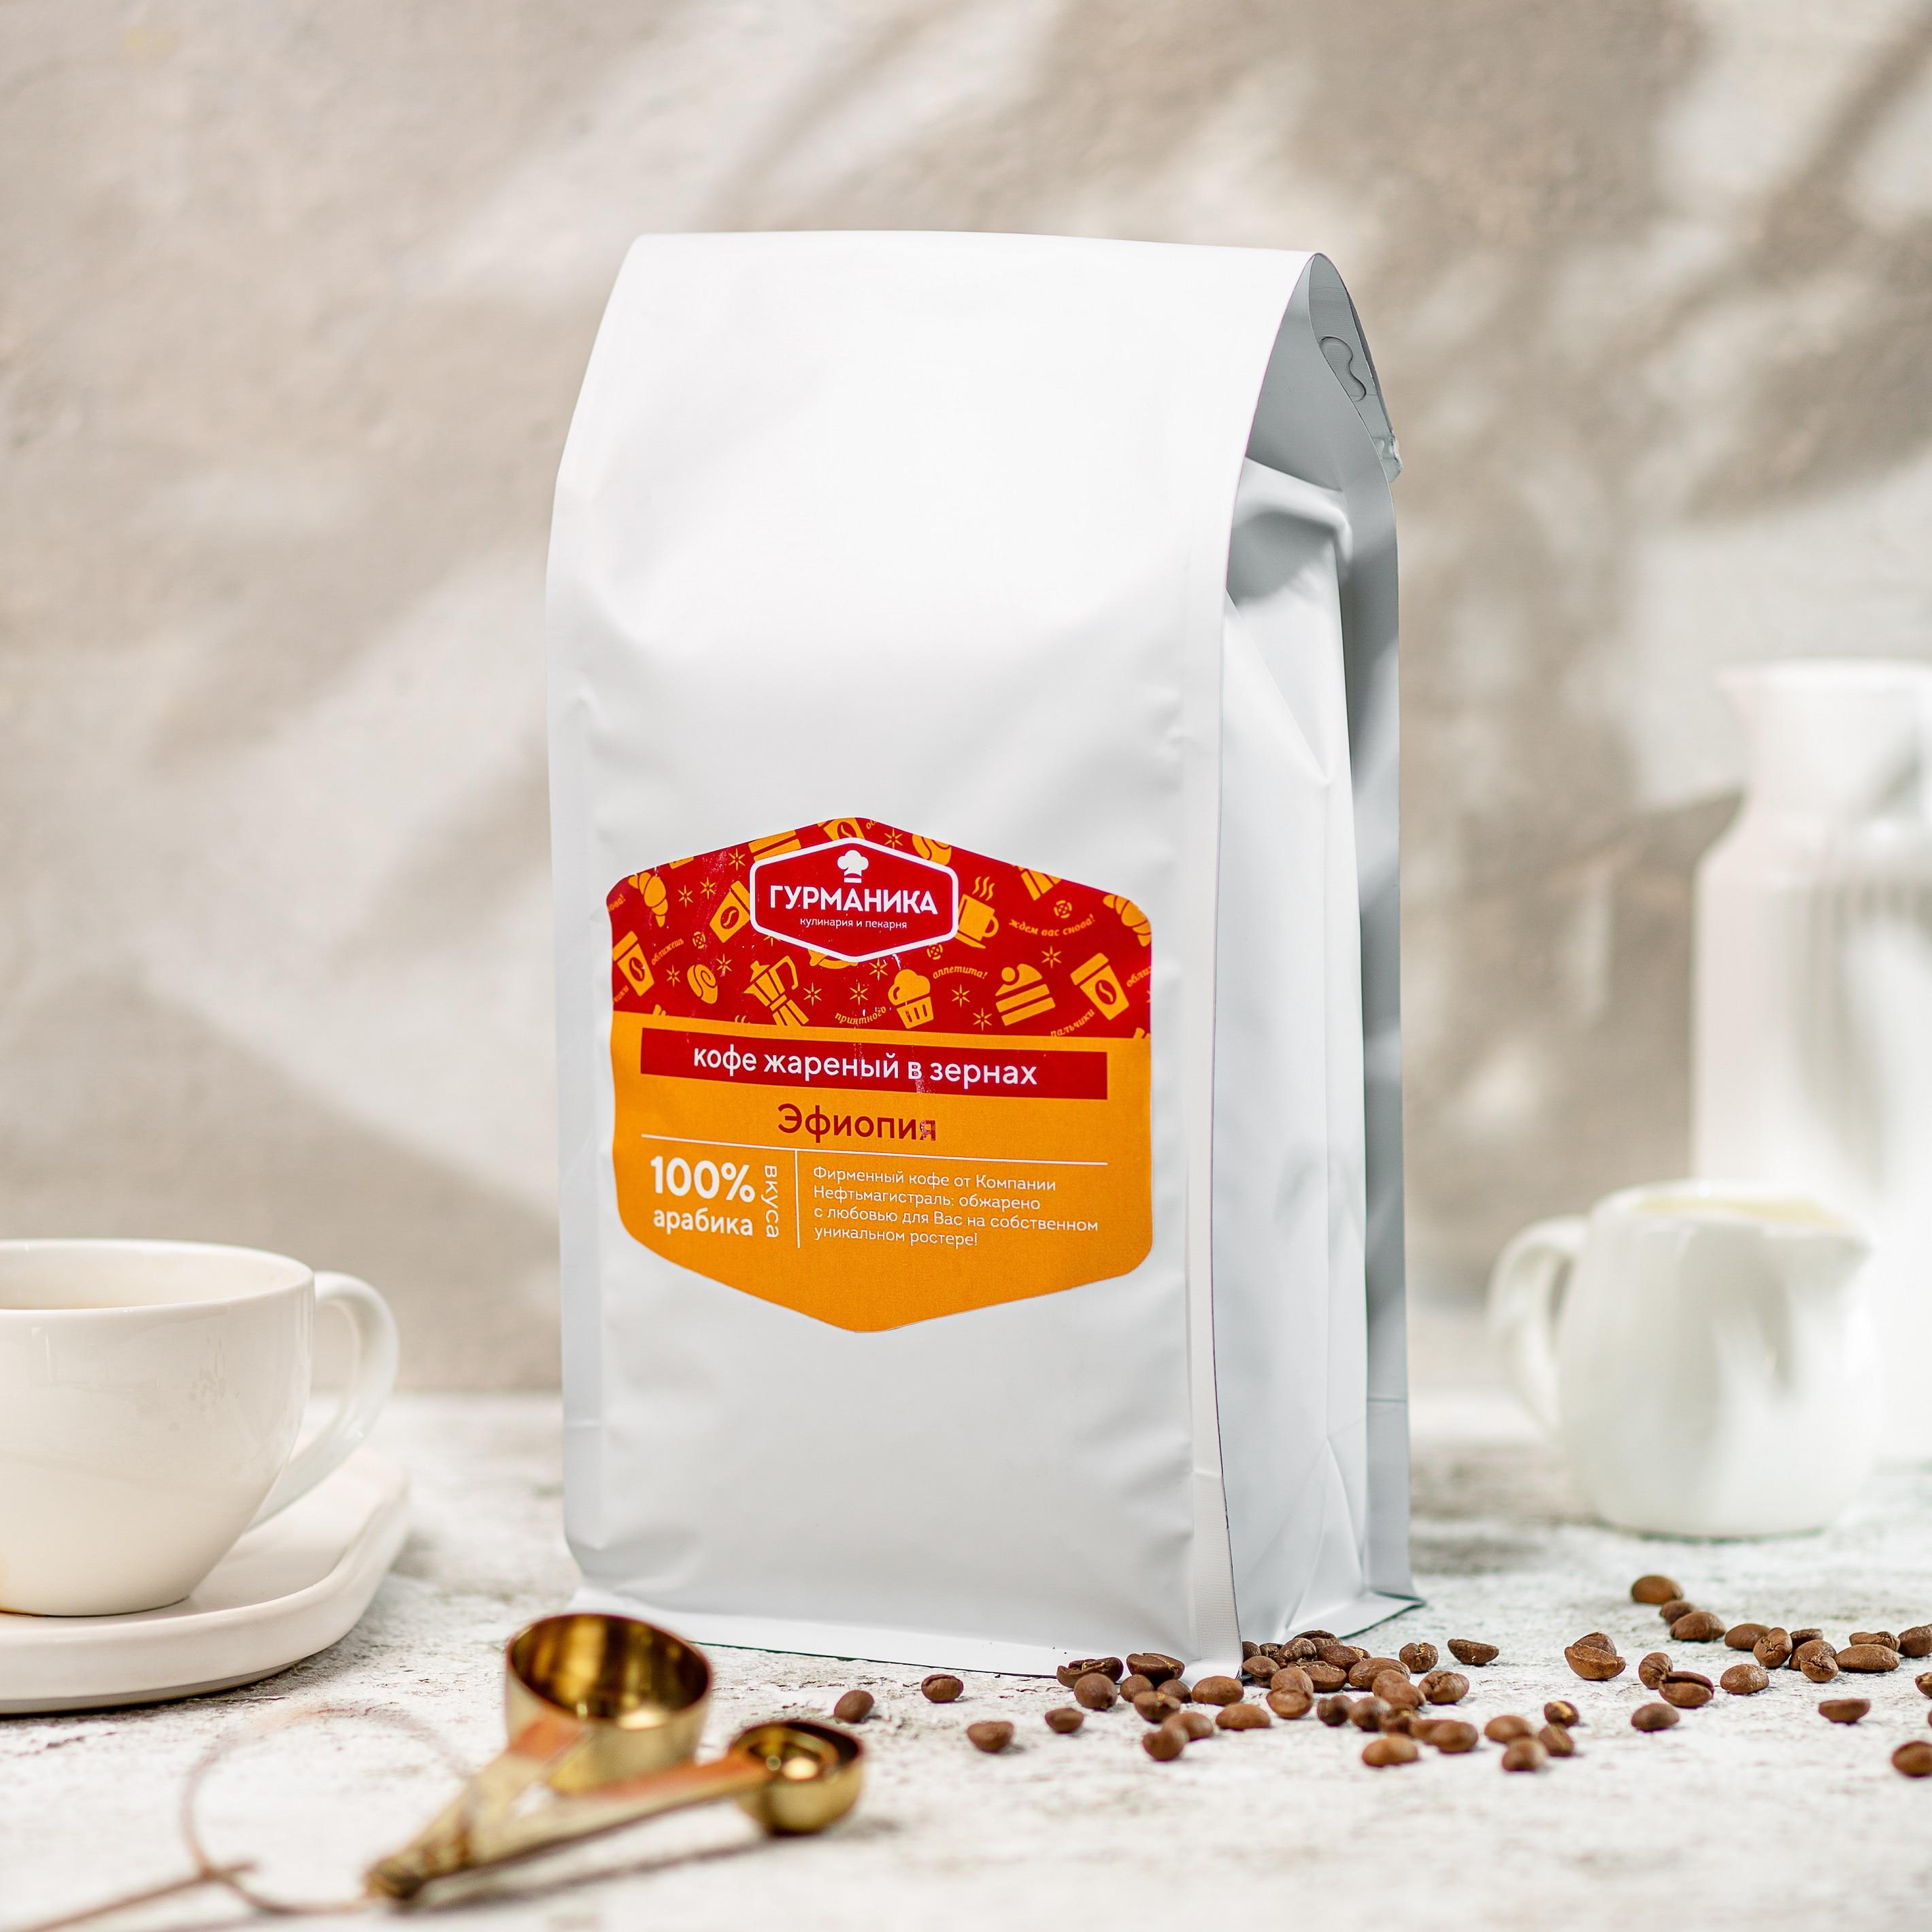 Gurmanica ● coffee natural fried in beans Ethiopia, 100% Arabica